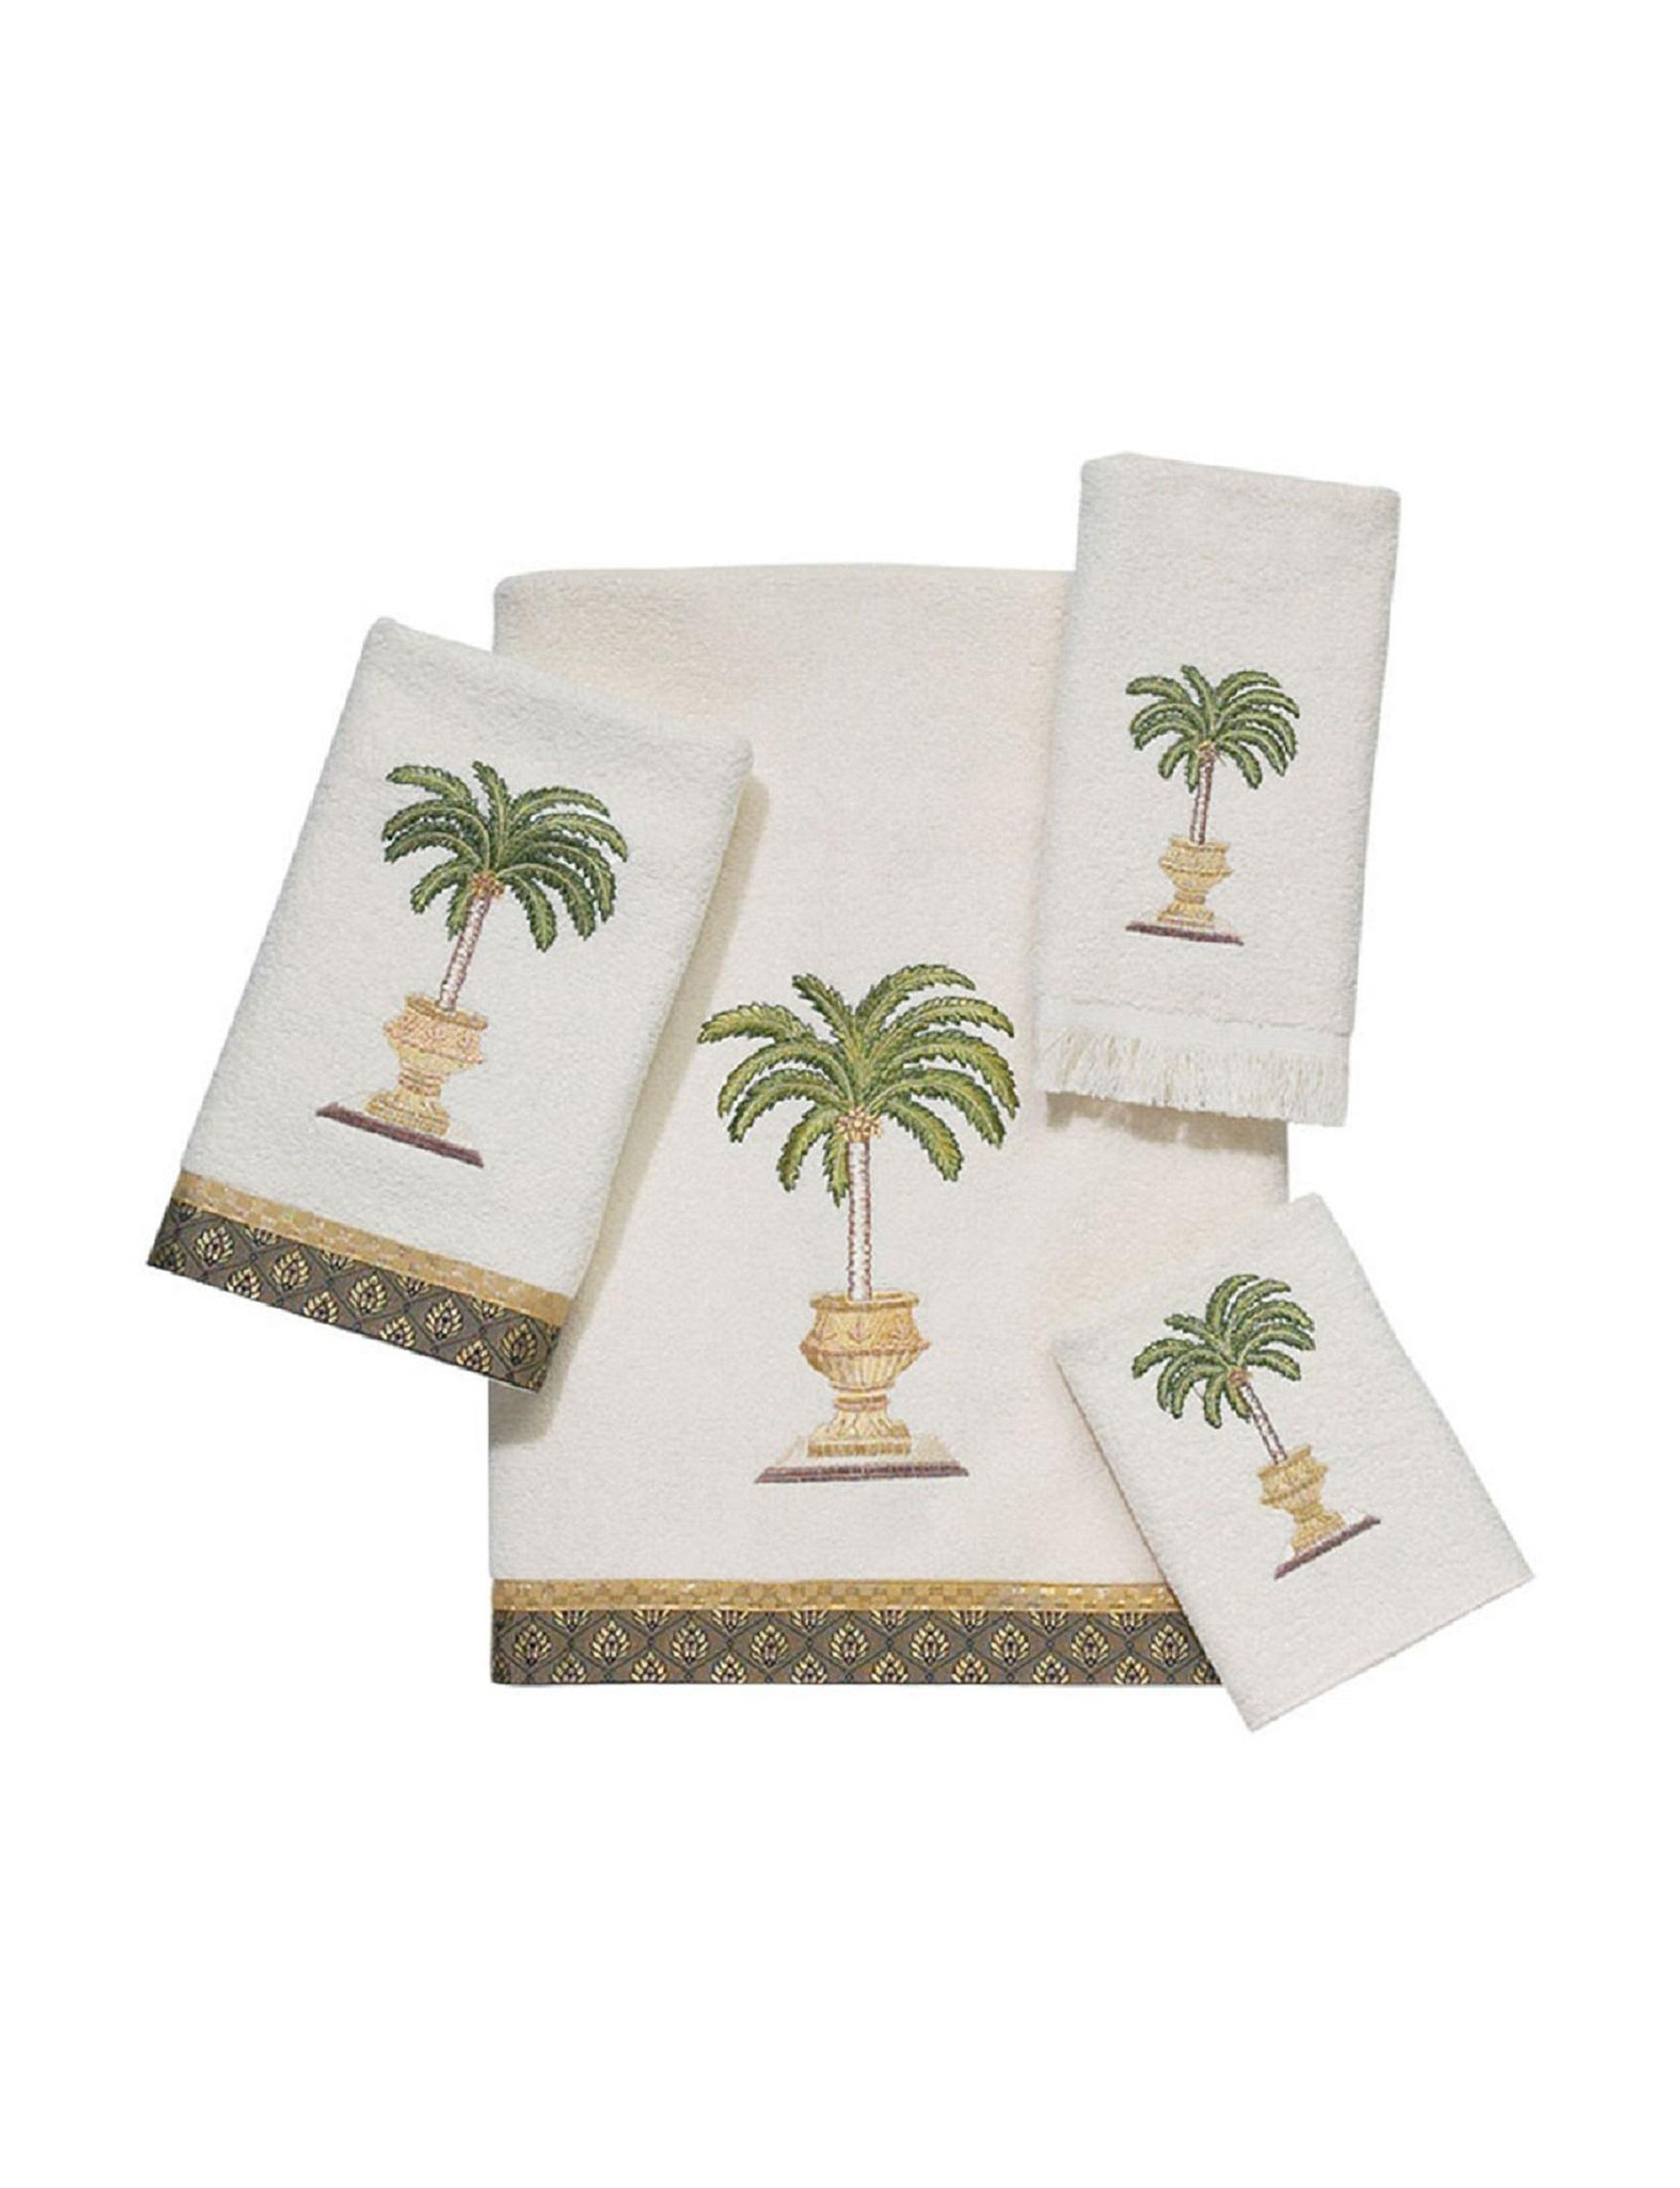 Avanti Ivory Towel Sets Towels